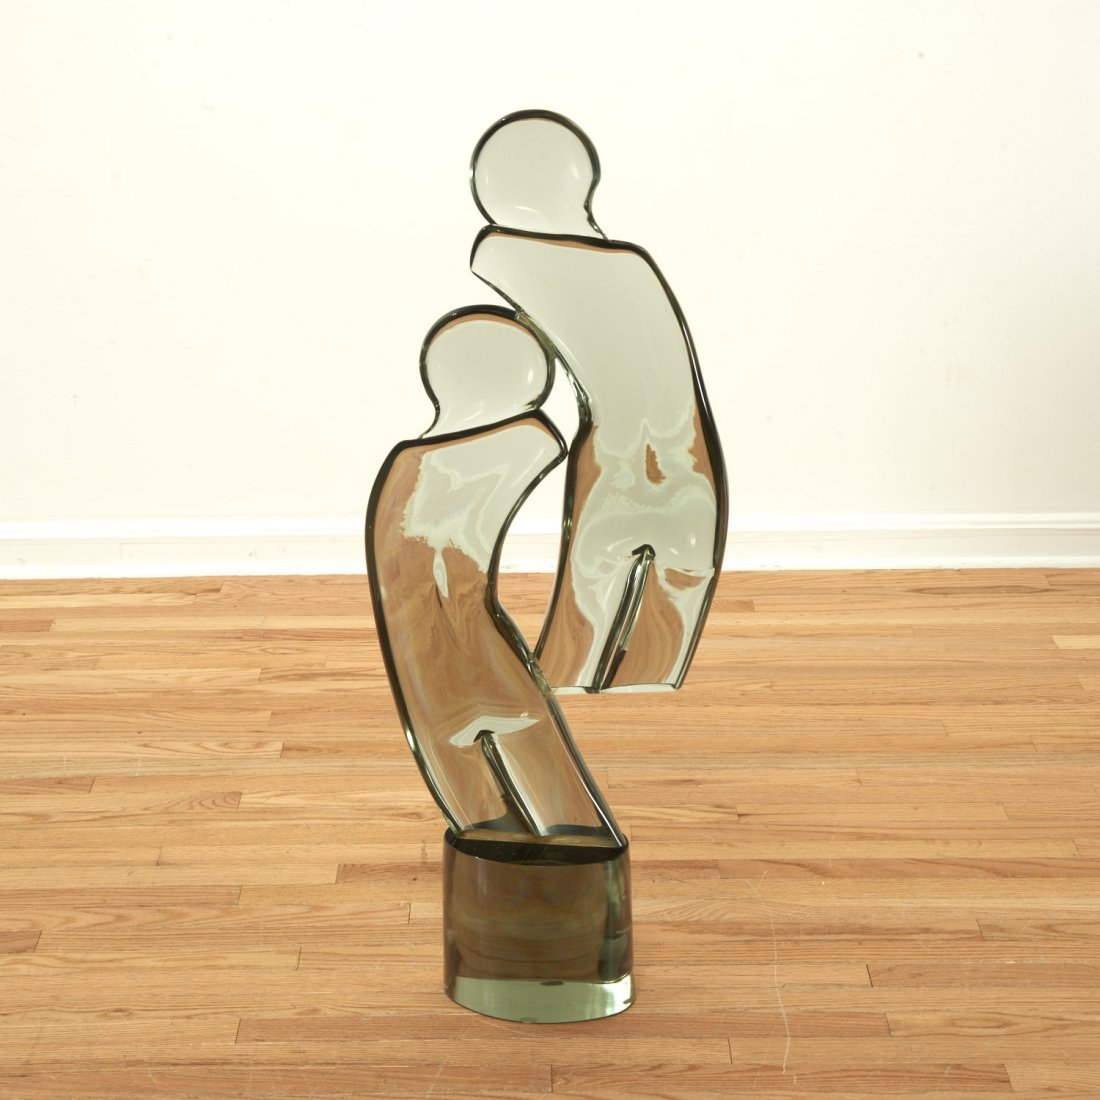 Loredano Rosin, glass sculpture - 5